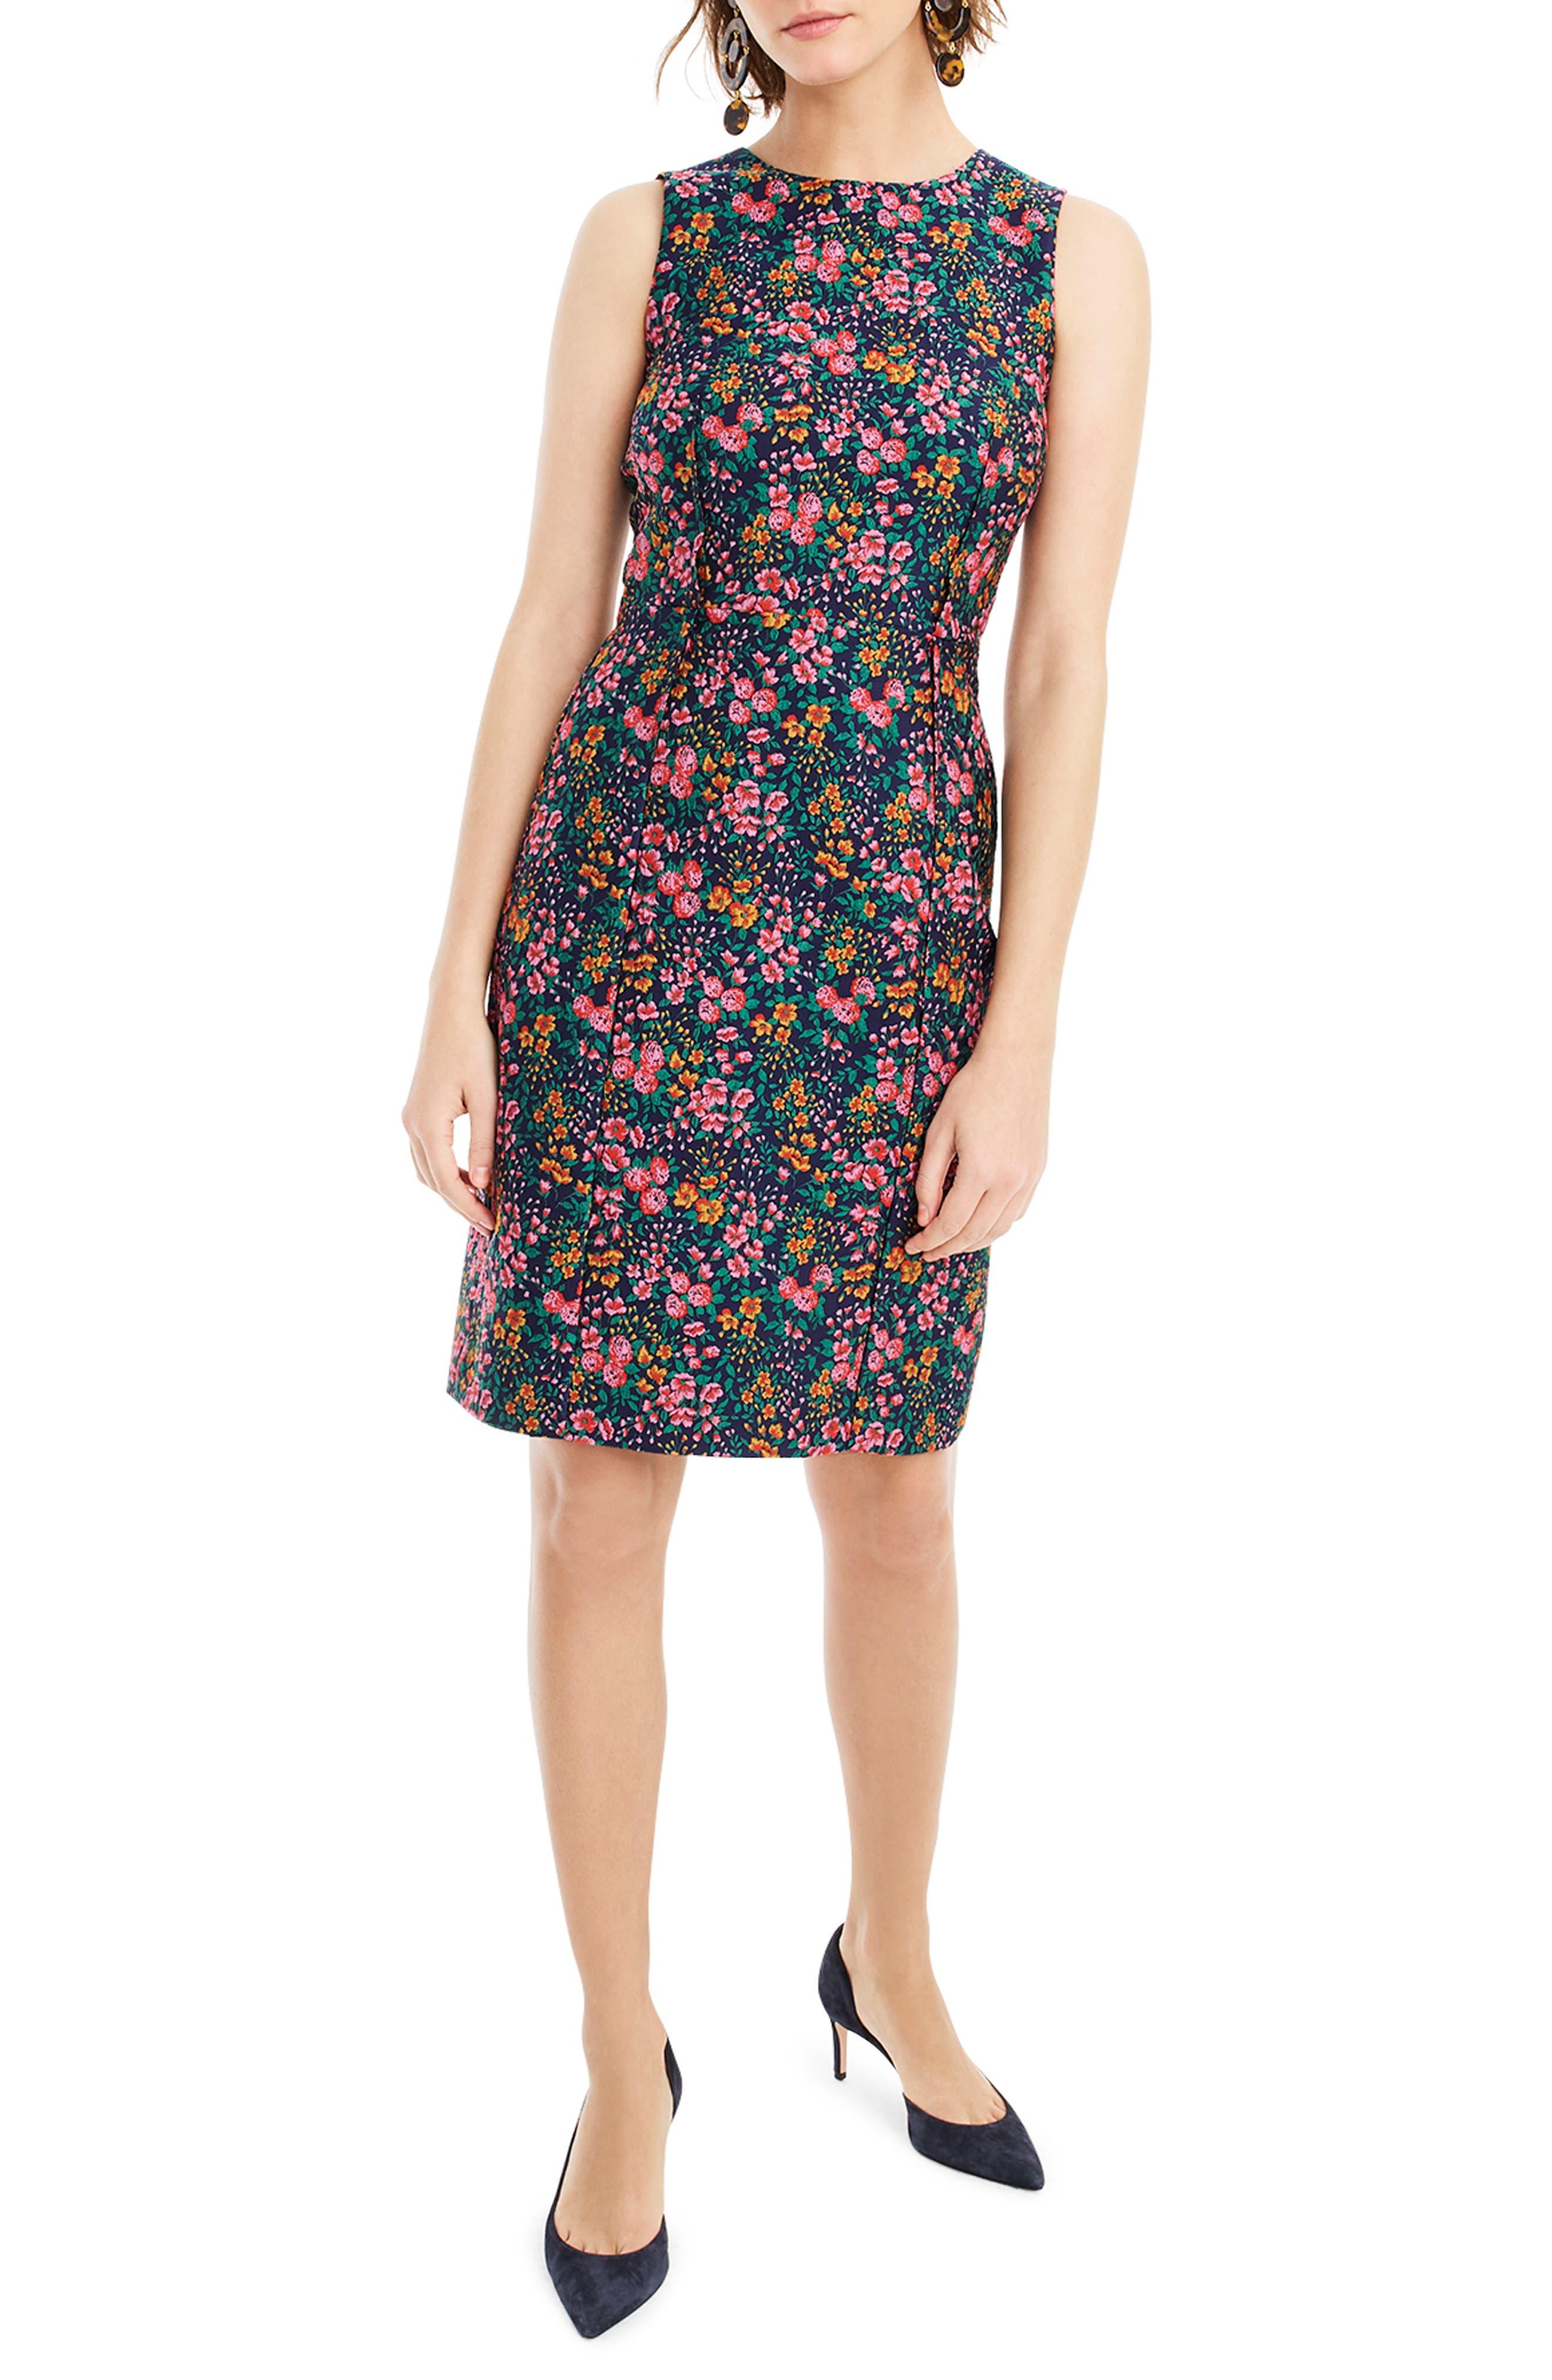 7f2ad348911 Dresses J.Crew Clothing for Women